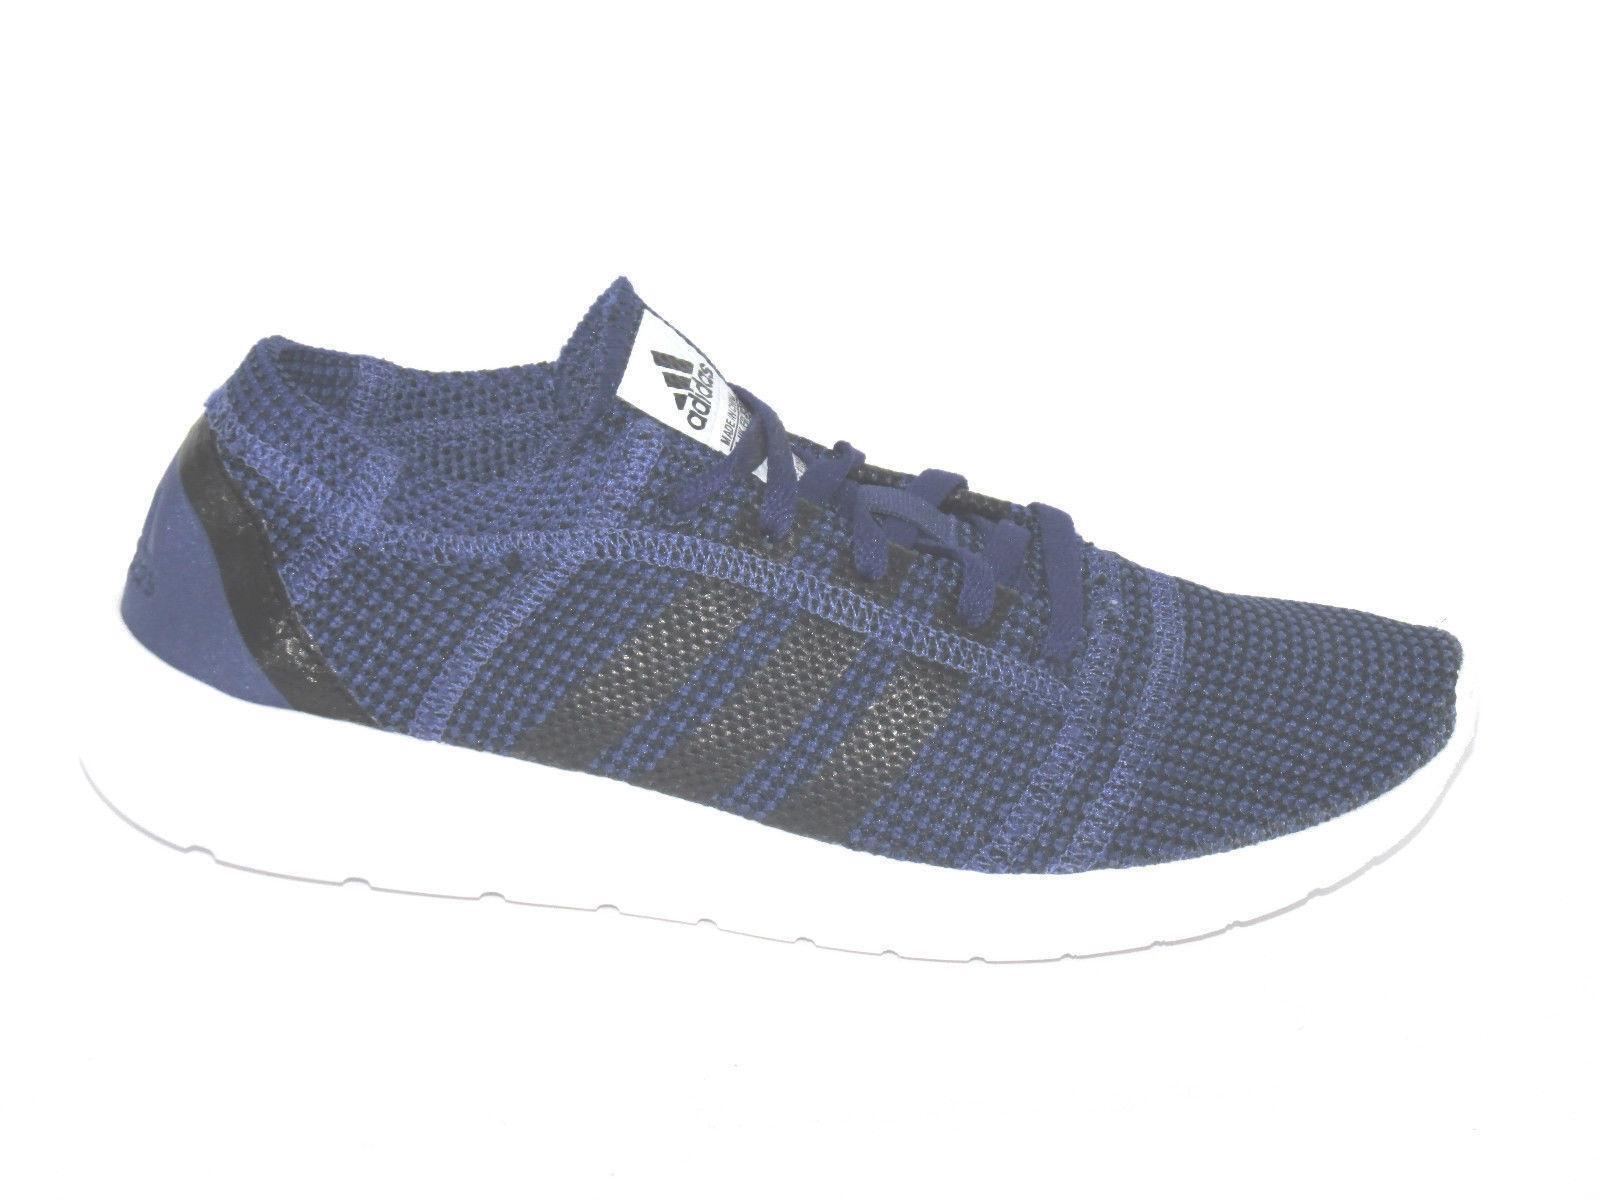 Adidas da da da Donna Element Refine Tricot Scarpe Sportive M21112 991917